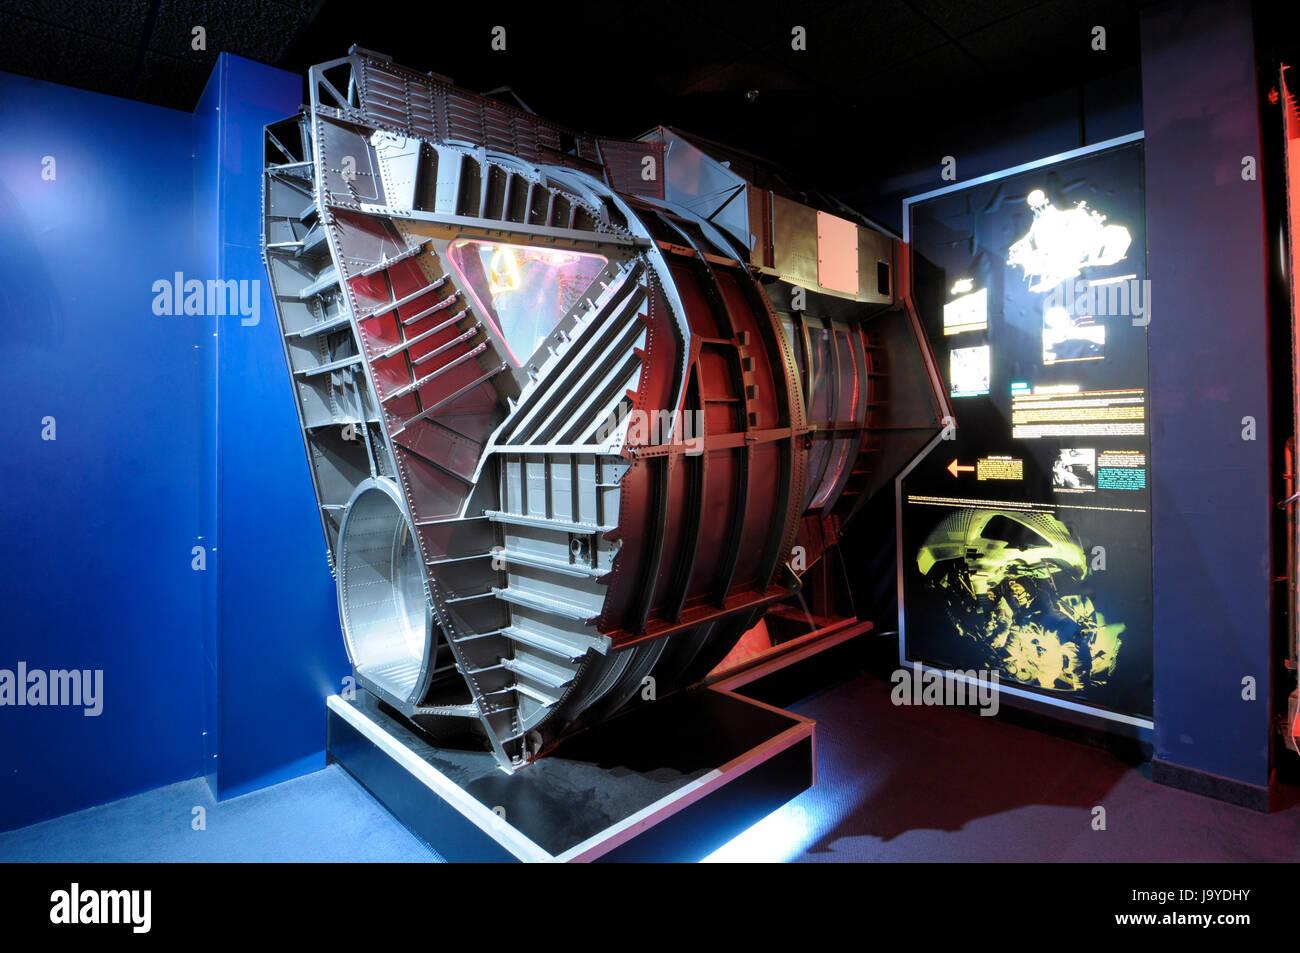 Lunar Module ascent stage test unit, Kansas Cosmosphere and Space Center, Hutchinson, Kansas. - Stock Image